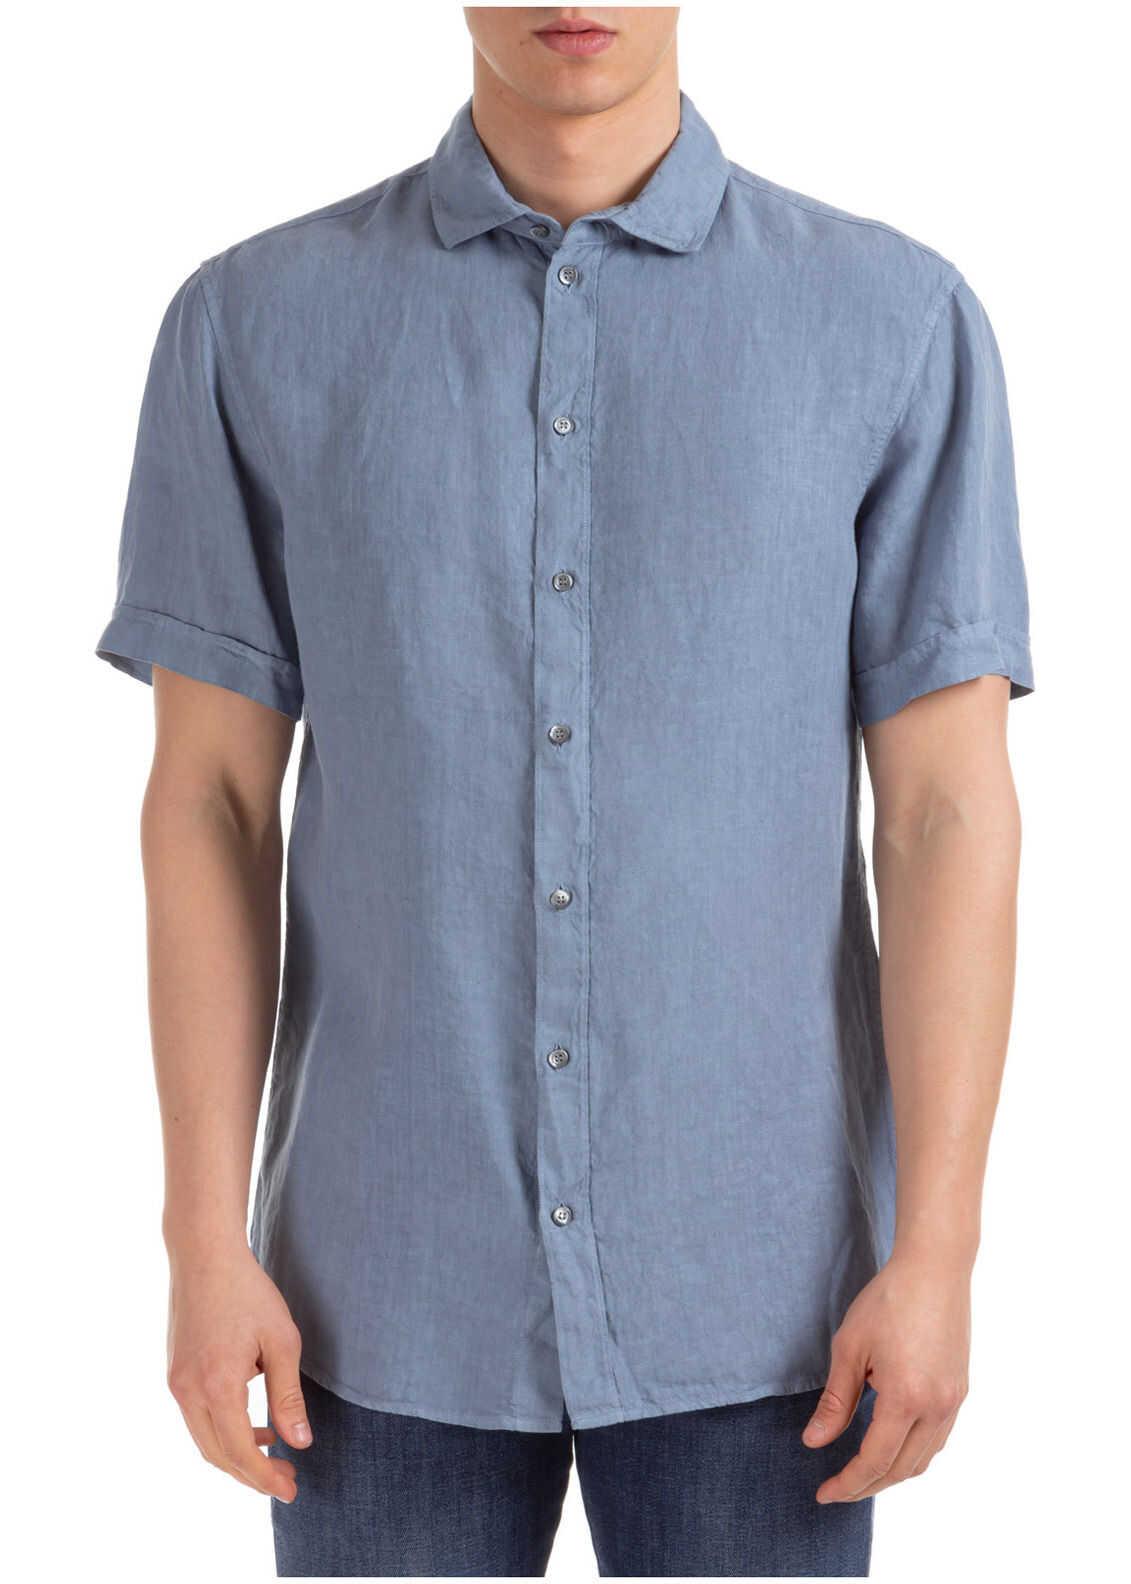 Emporio Armani Short Sleeve Shirt T-Shirt Grey imagine